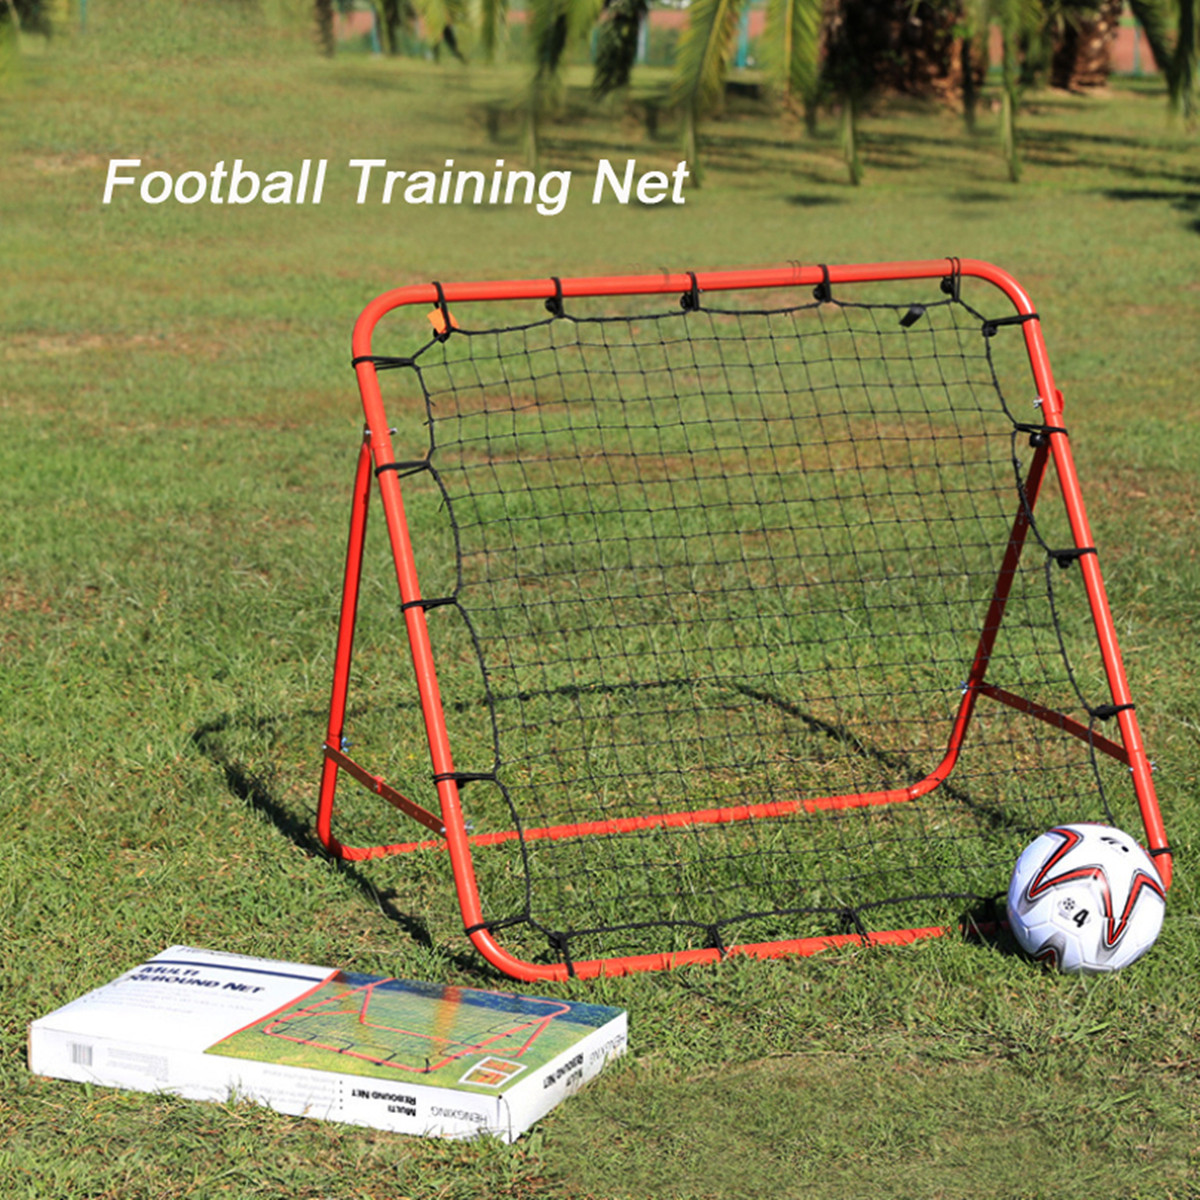 Football Football Baseball Rebond Cible Mesh Net Sports de Plein Air Football Aide à La Formation Pratique De Ballon De Football